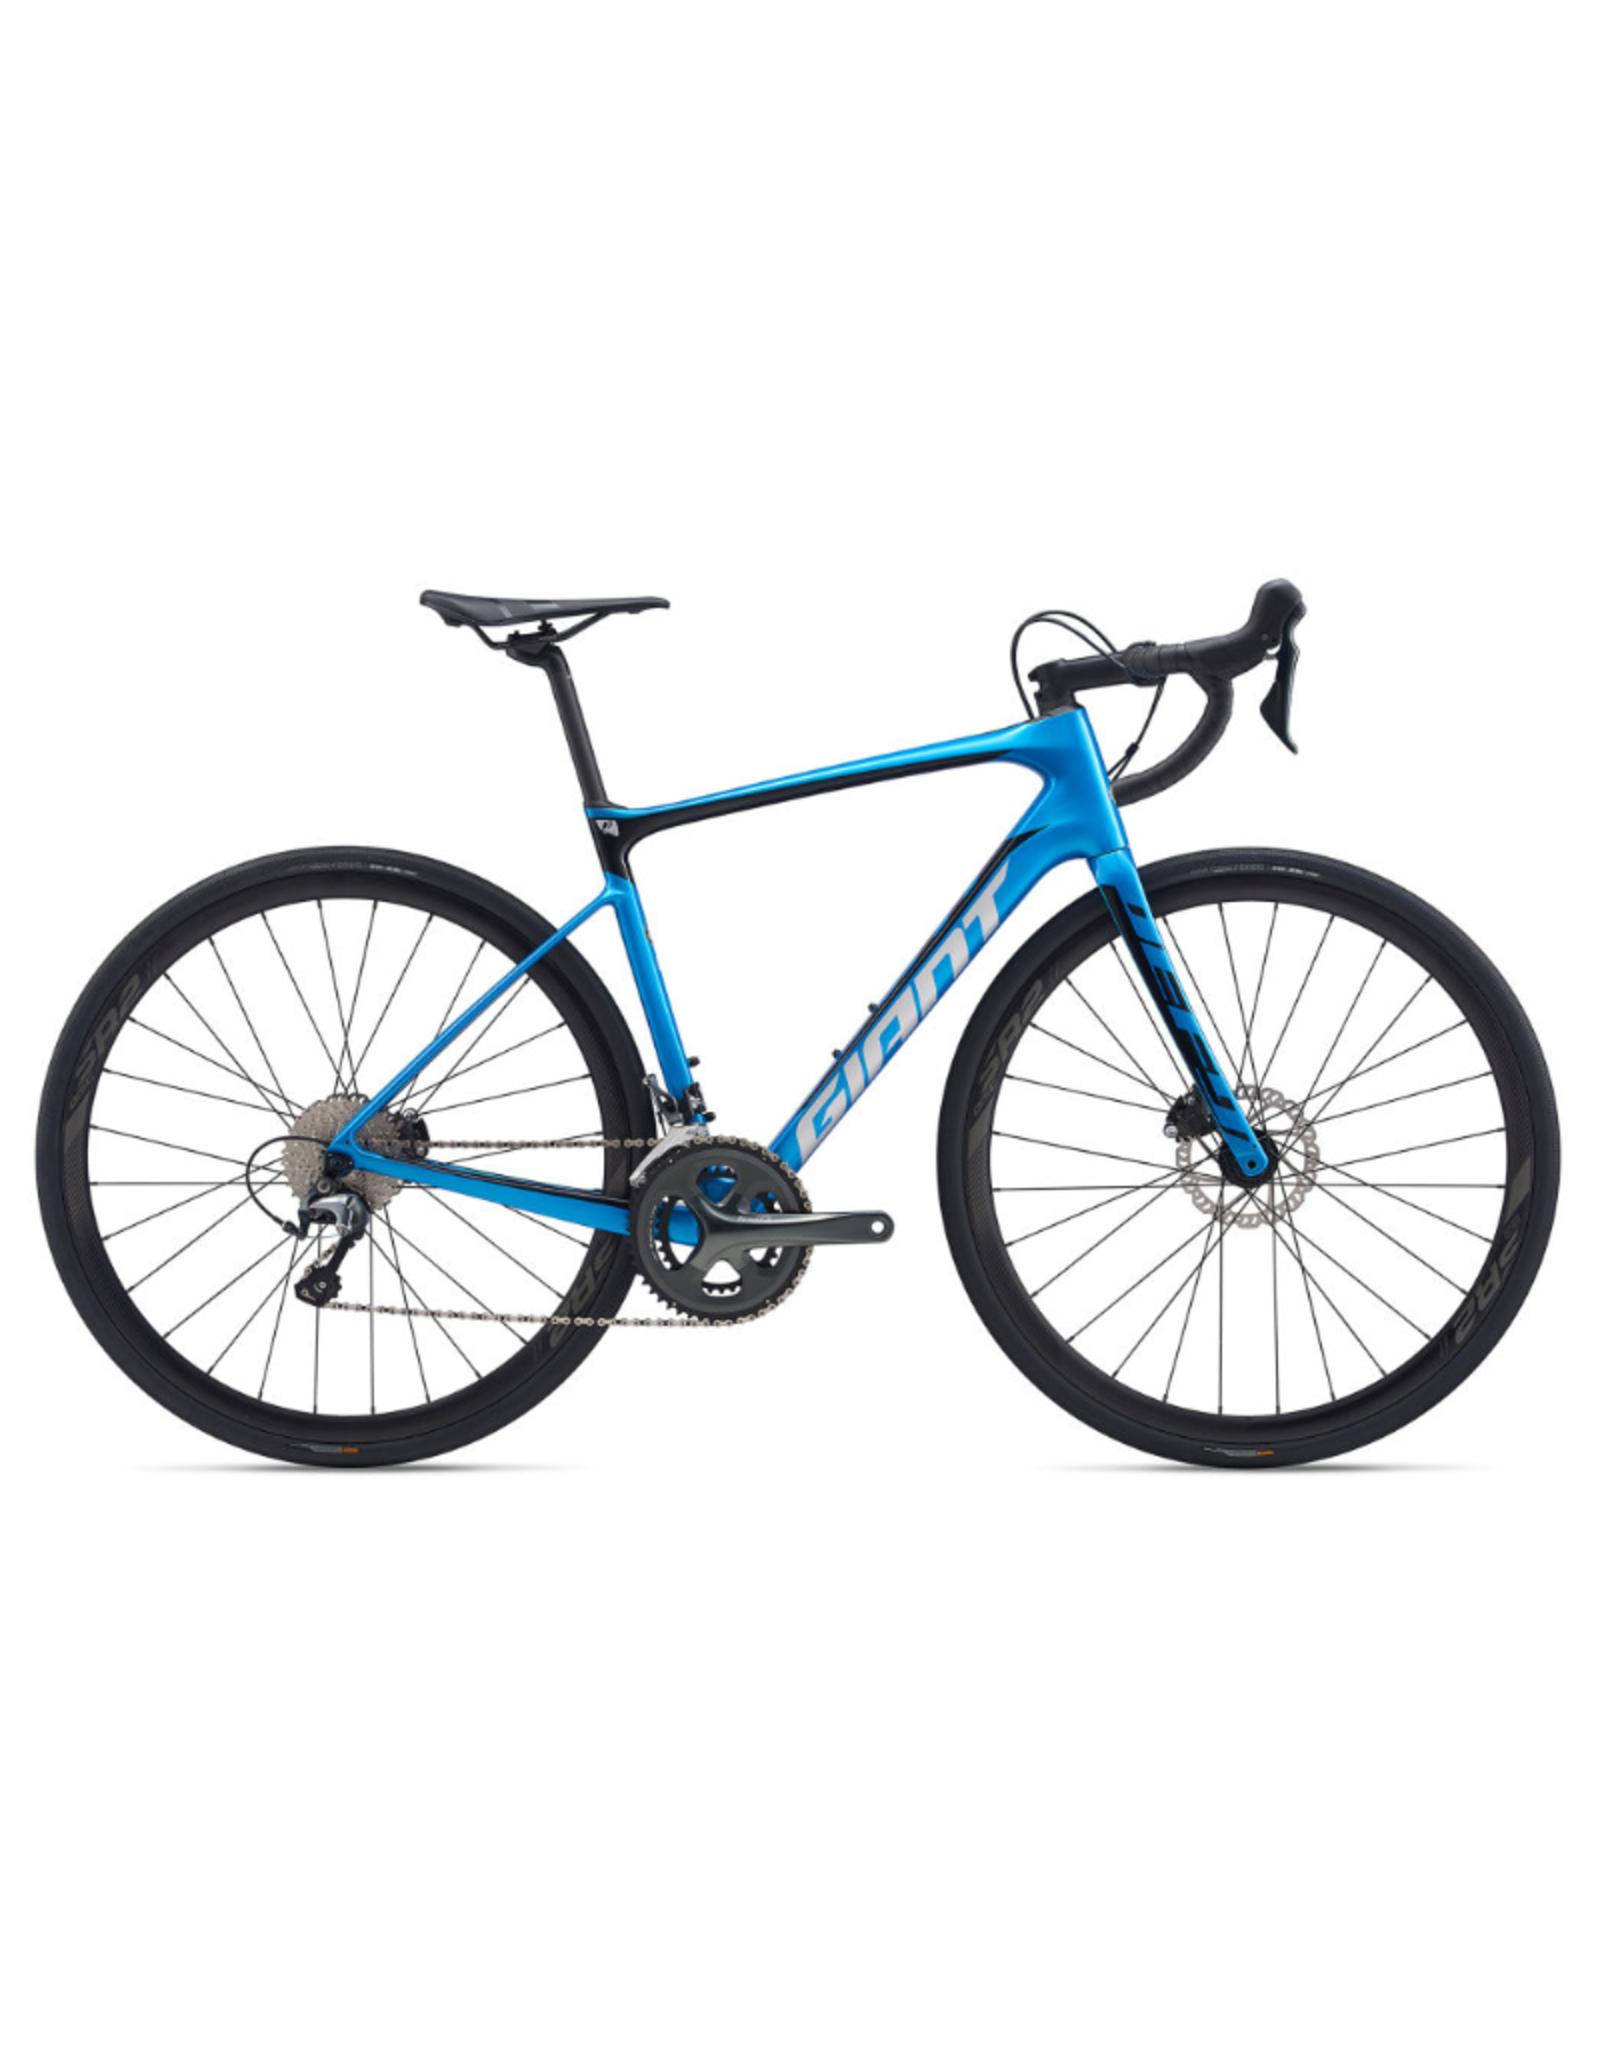 Giant Defy Advanced 3-HRD S Metallic Blue